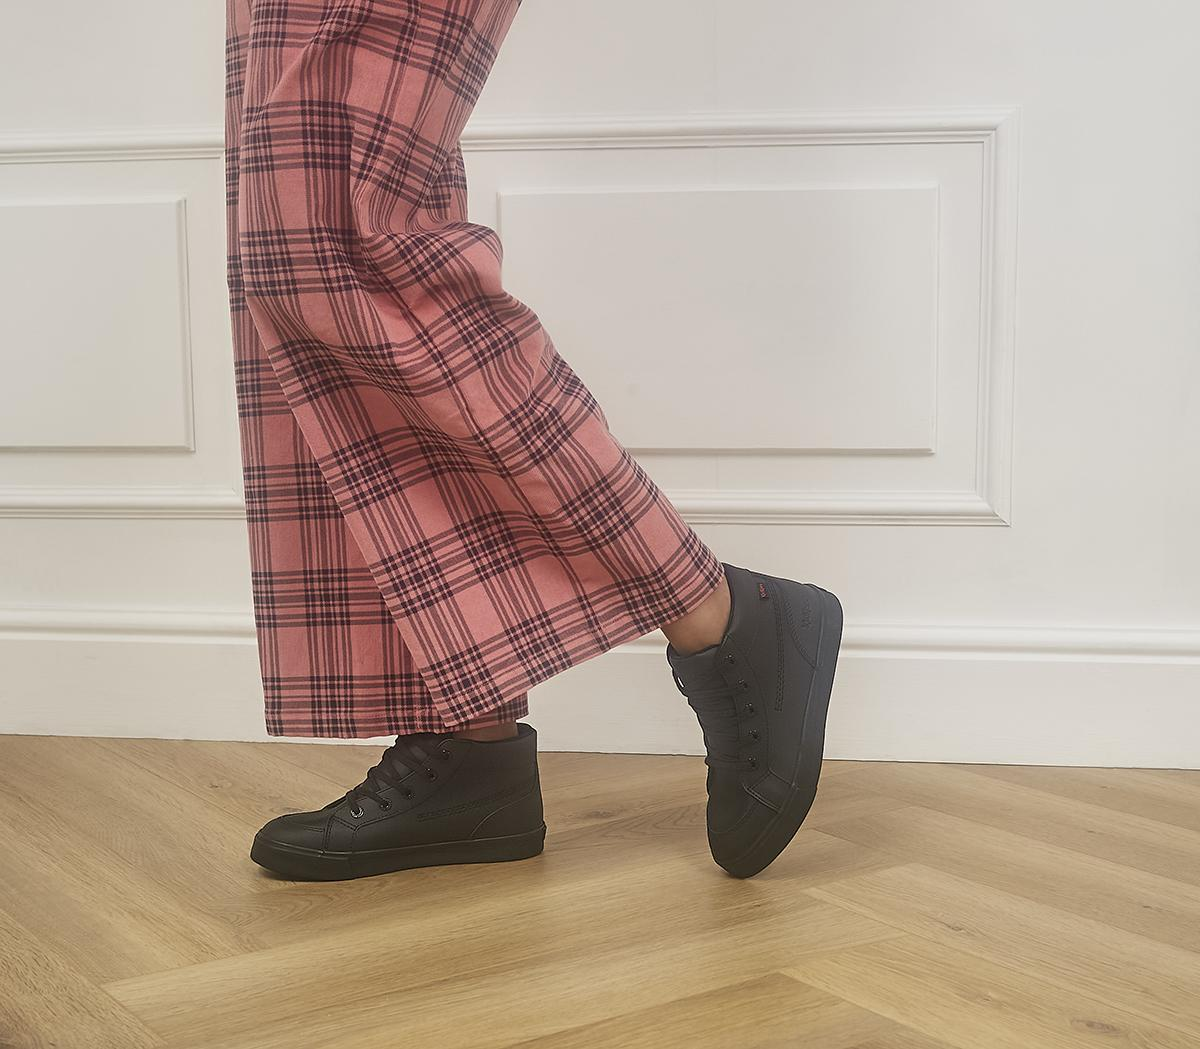 Tovni Hi Youth Boots